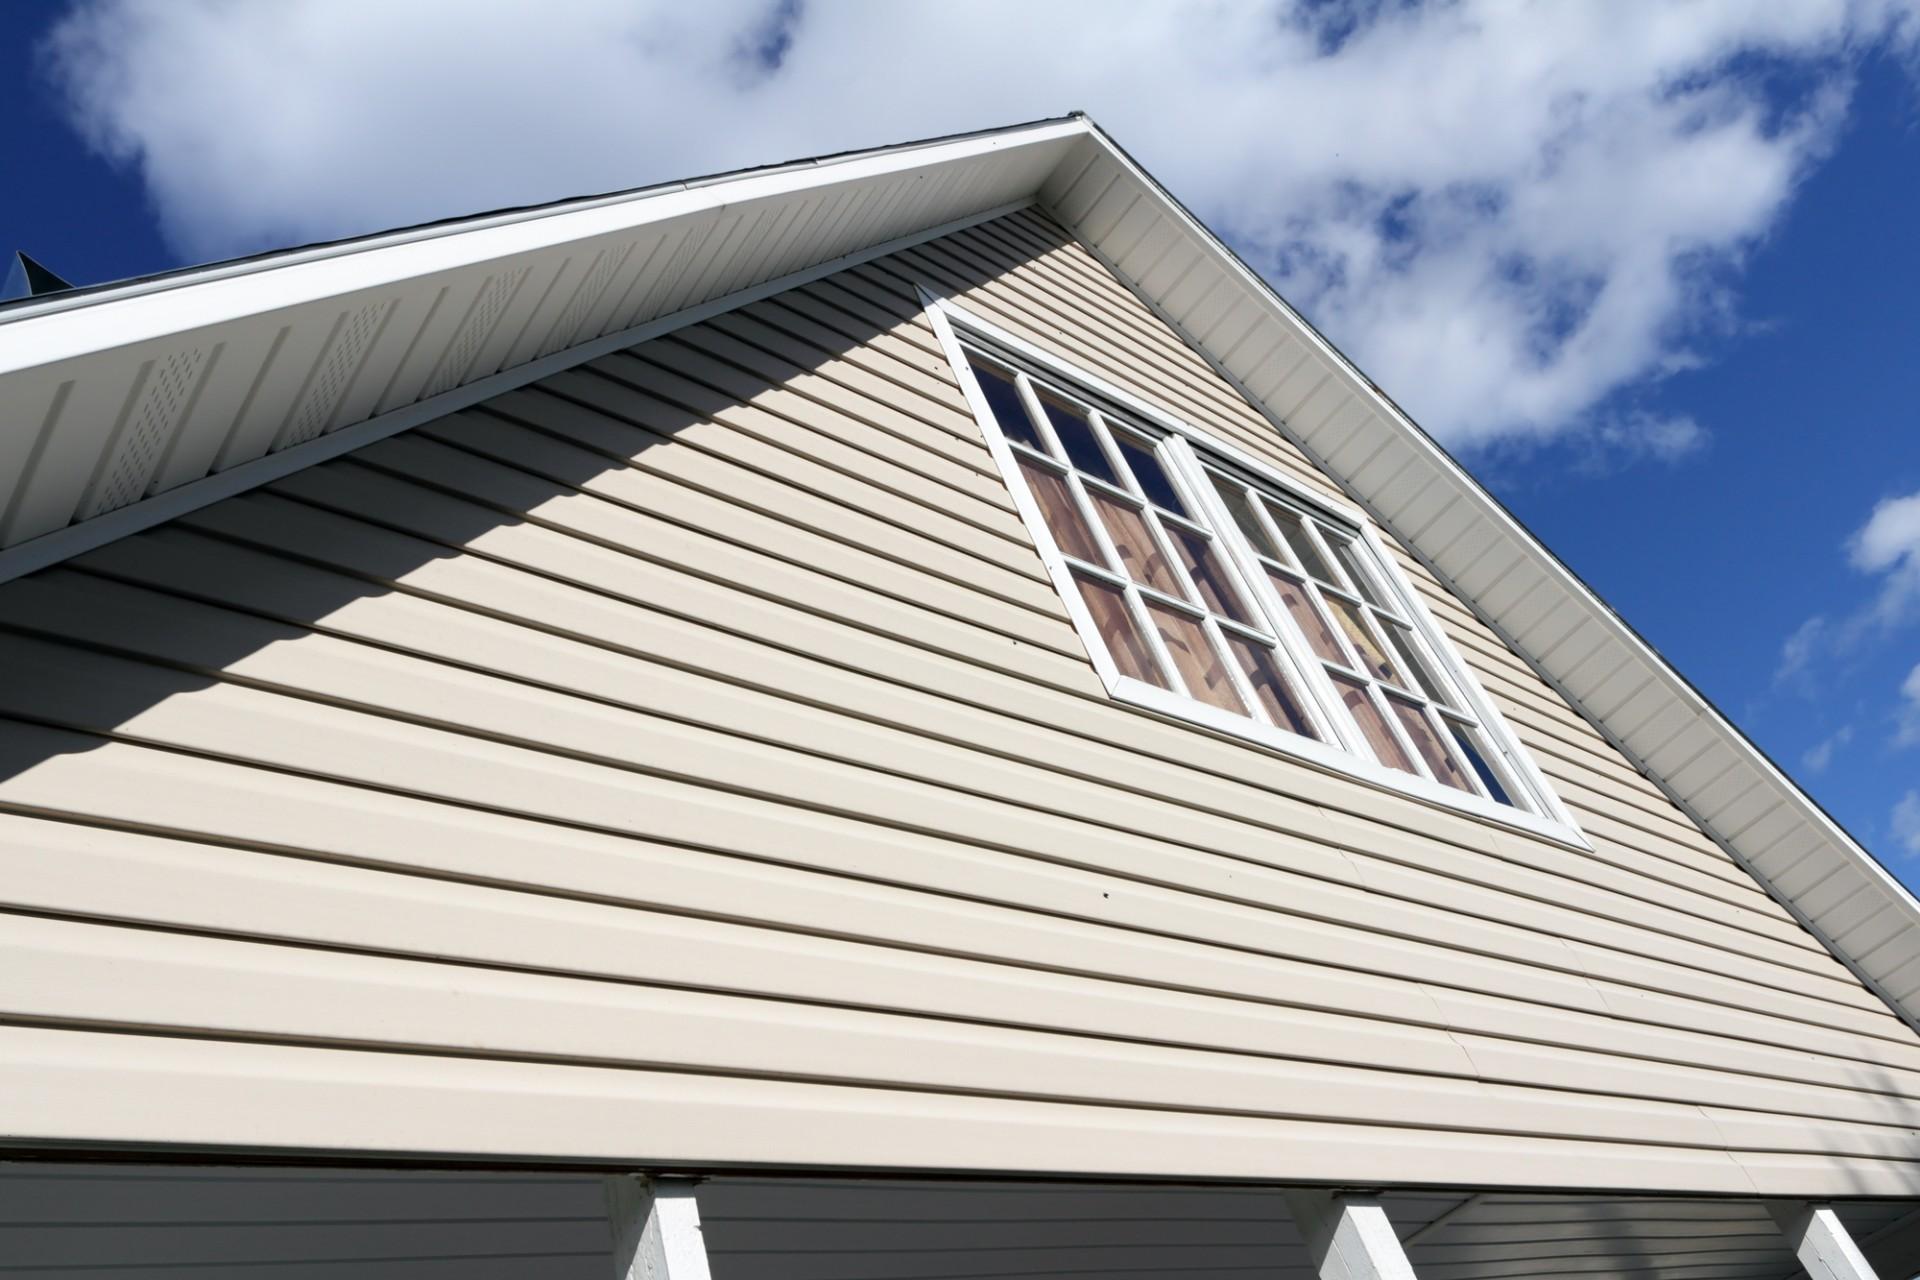 обшивка сайдингом фронтона крыши